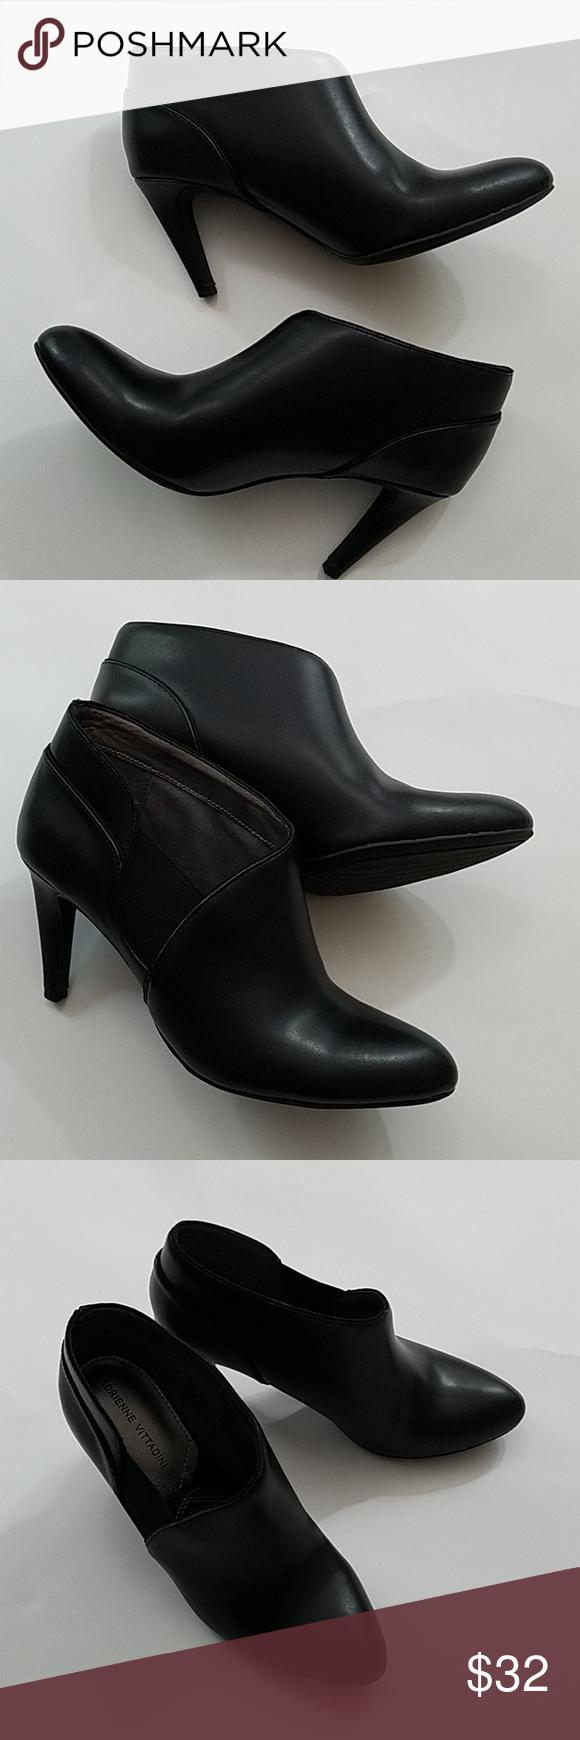 d092ce5dbb6 Booties Adrienne Vittadini AV- Tikki black leather 3in. Heel ankle ...